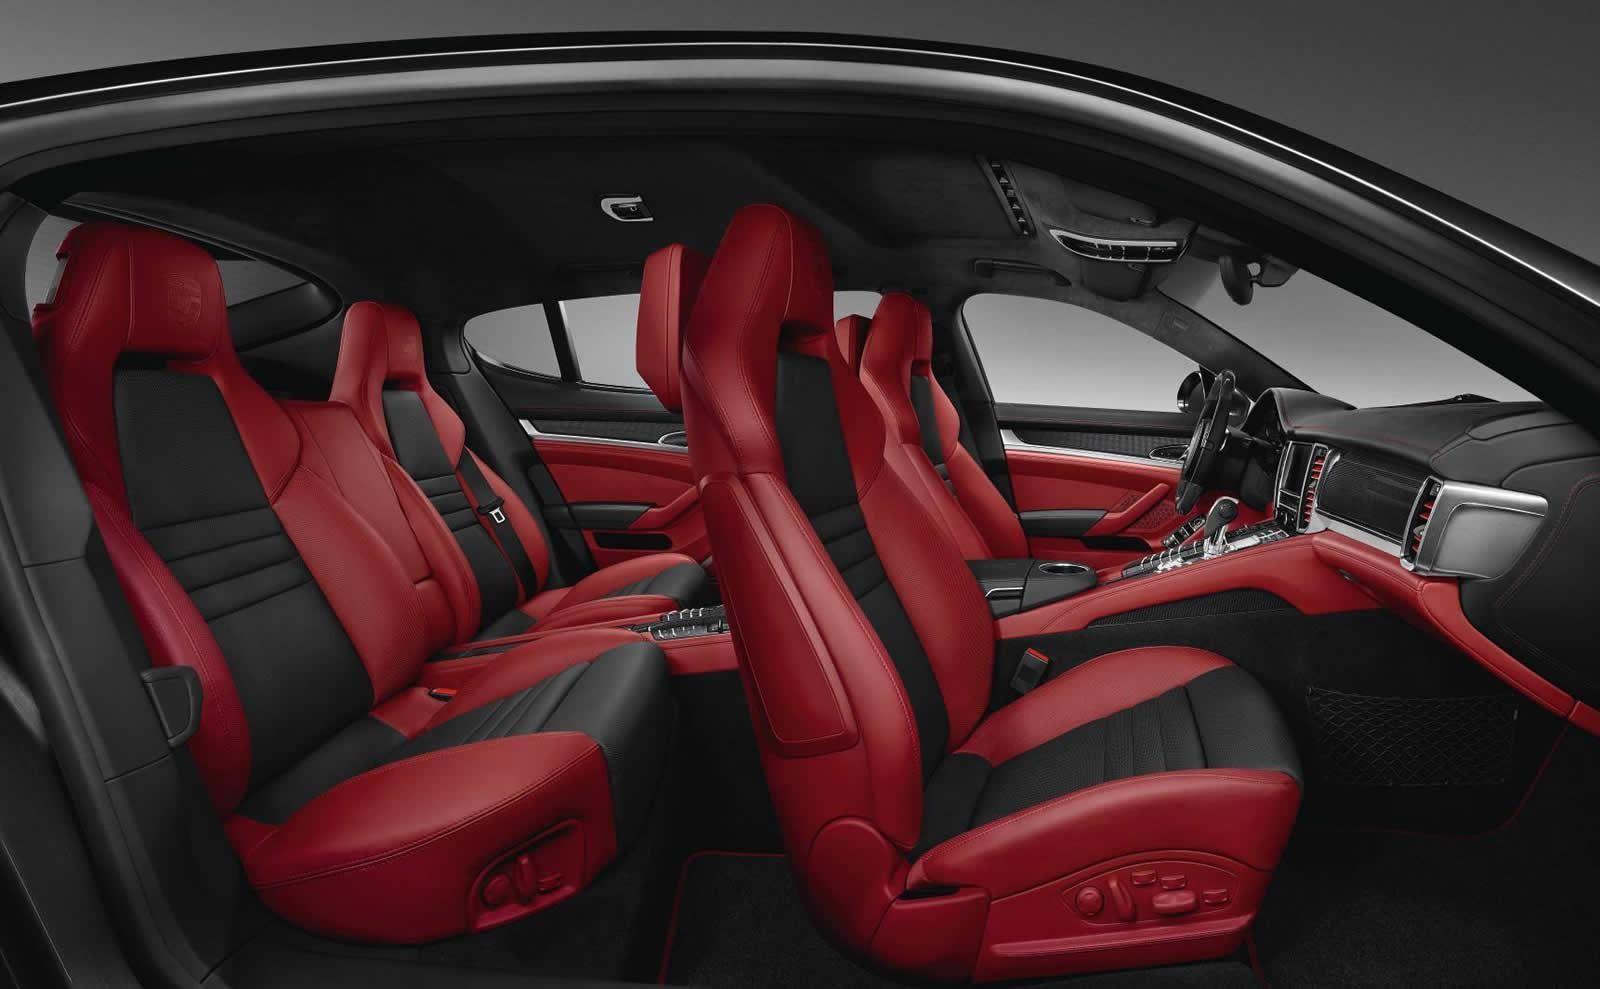 2014 porsche panamera interior car tuning - 2015 Porsche Panamera Turbo S Executive Front Interior Seats Jpg 2048 1360 Hoopties Pinterest Searching